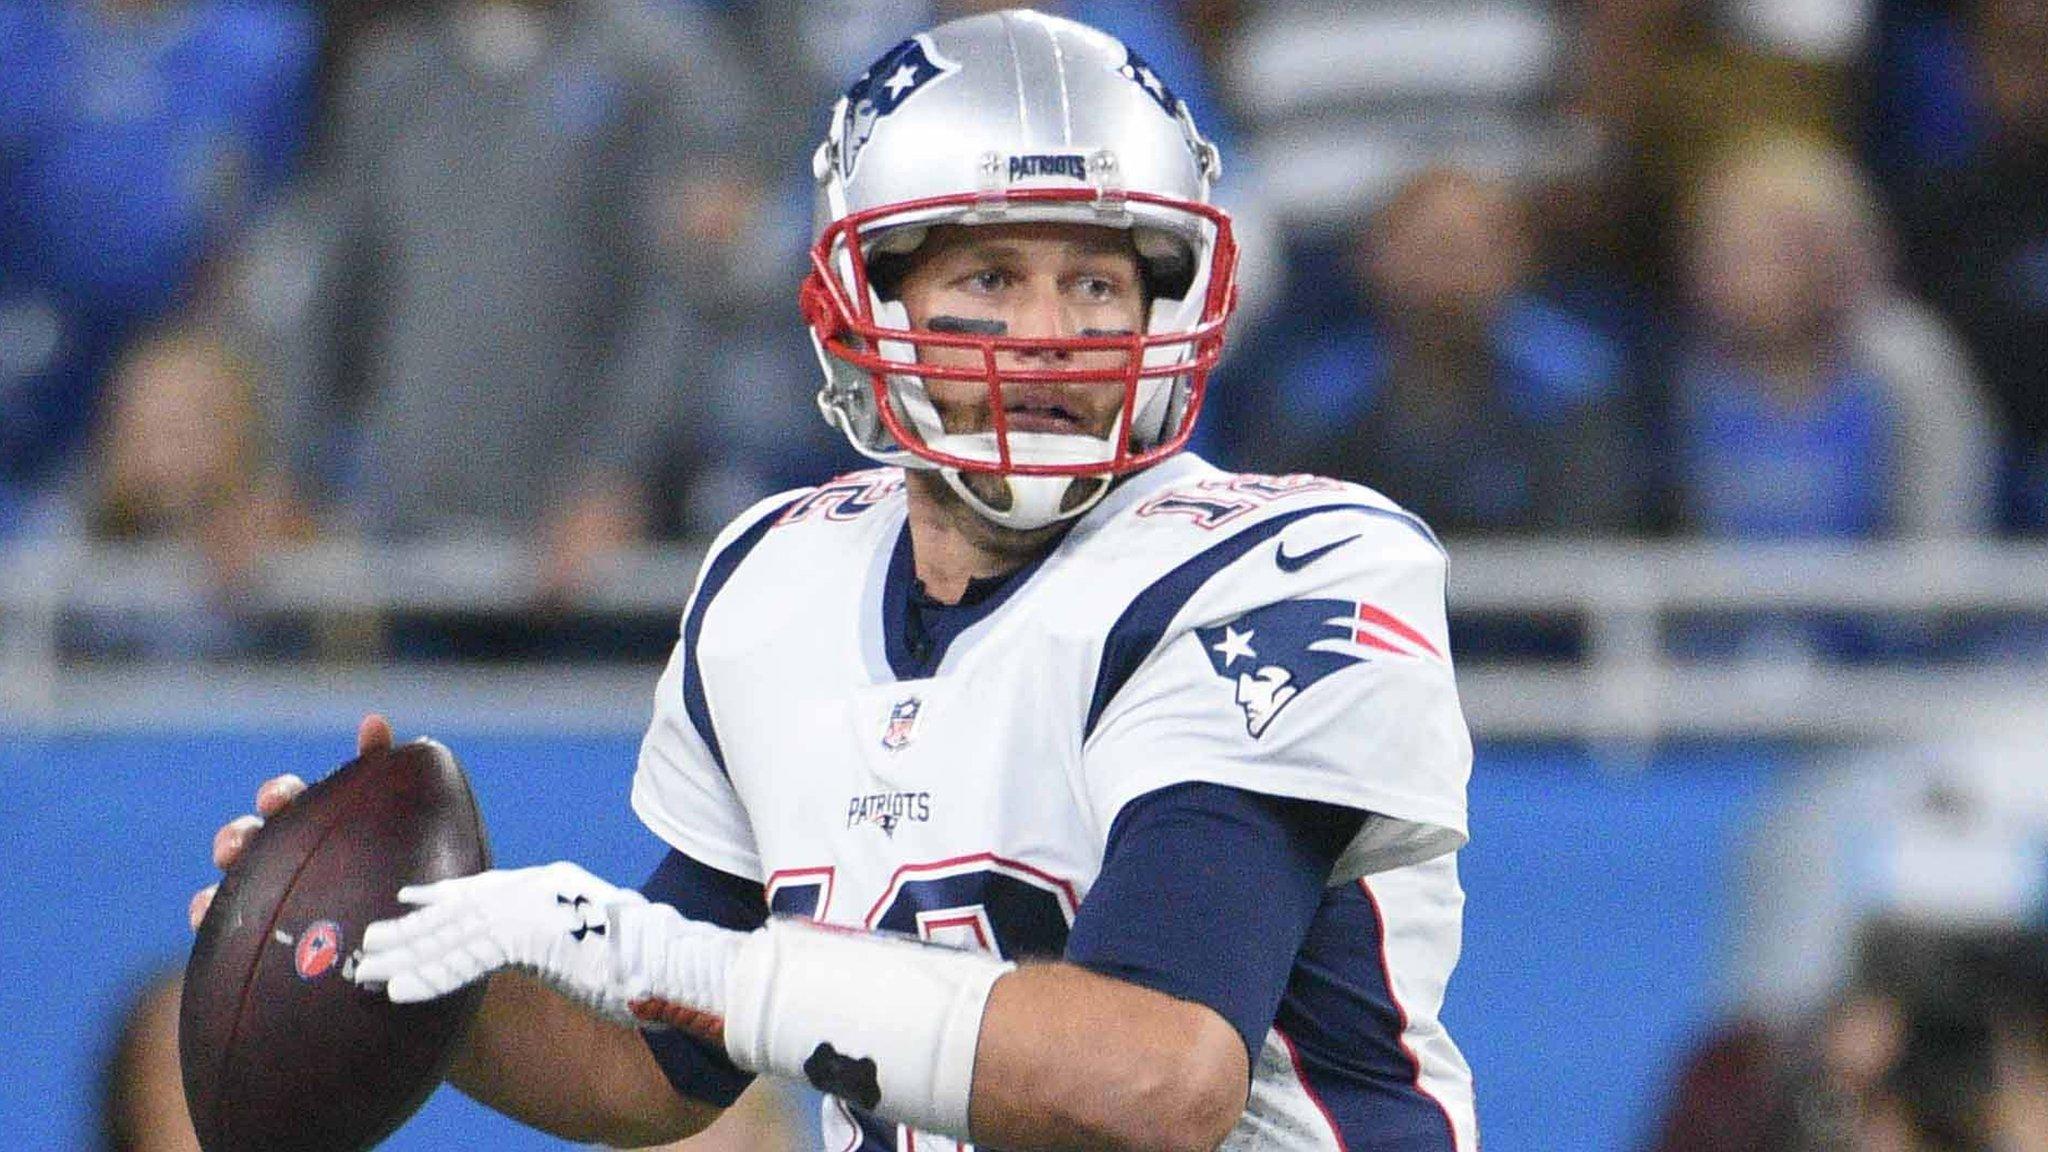 Patriots a pale imitation, Brees & Mahomes break records - week three NFL review